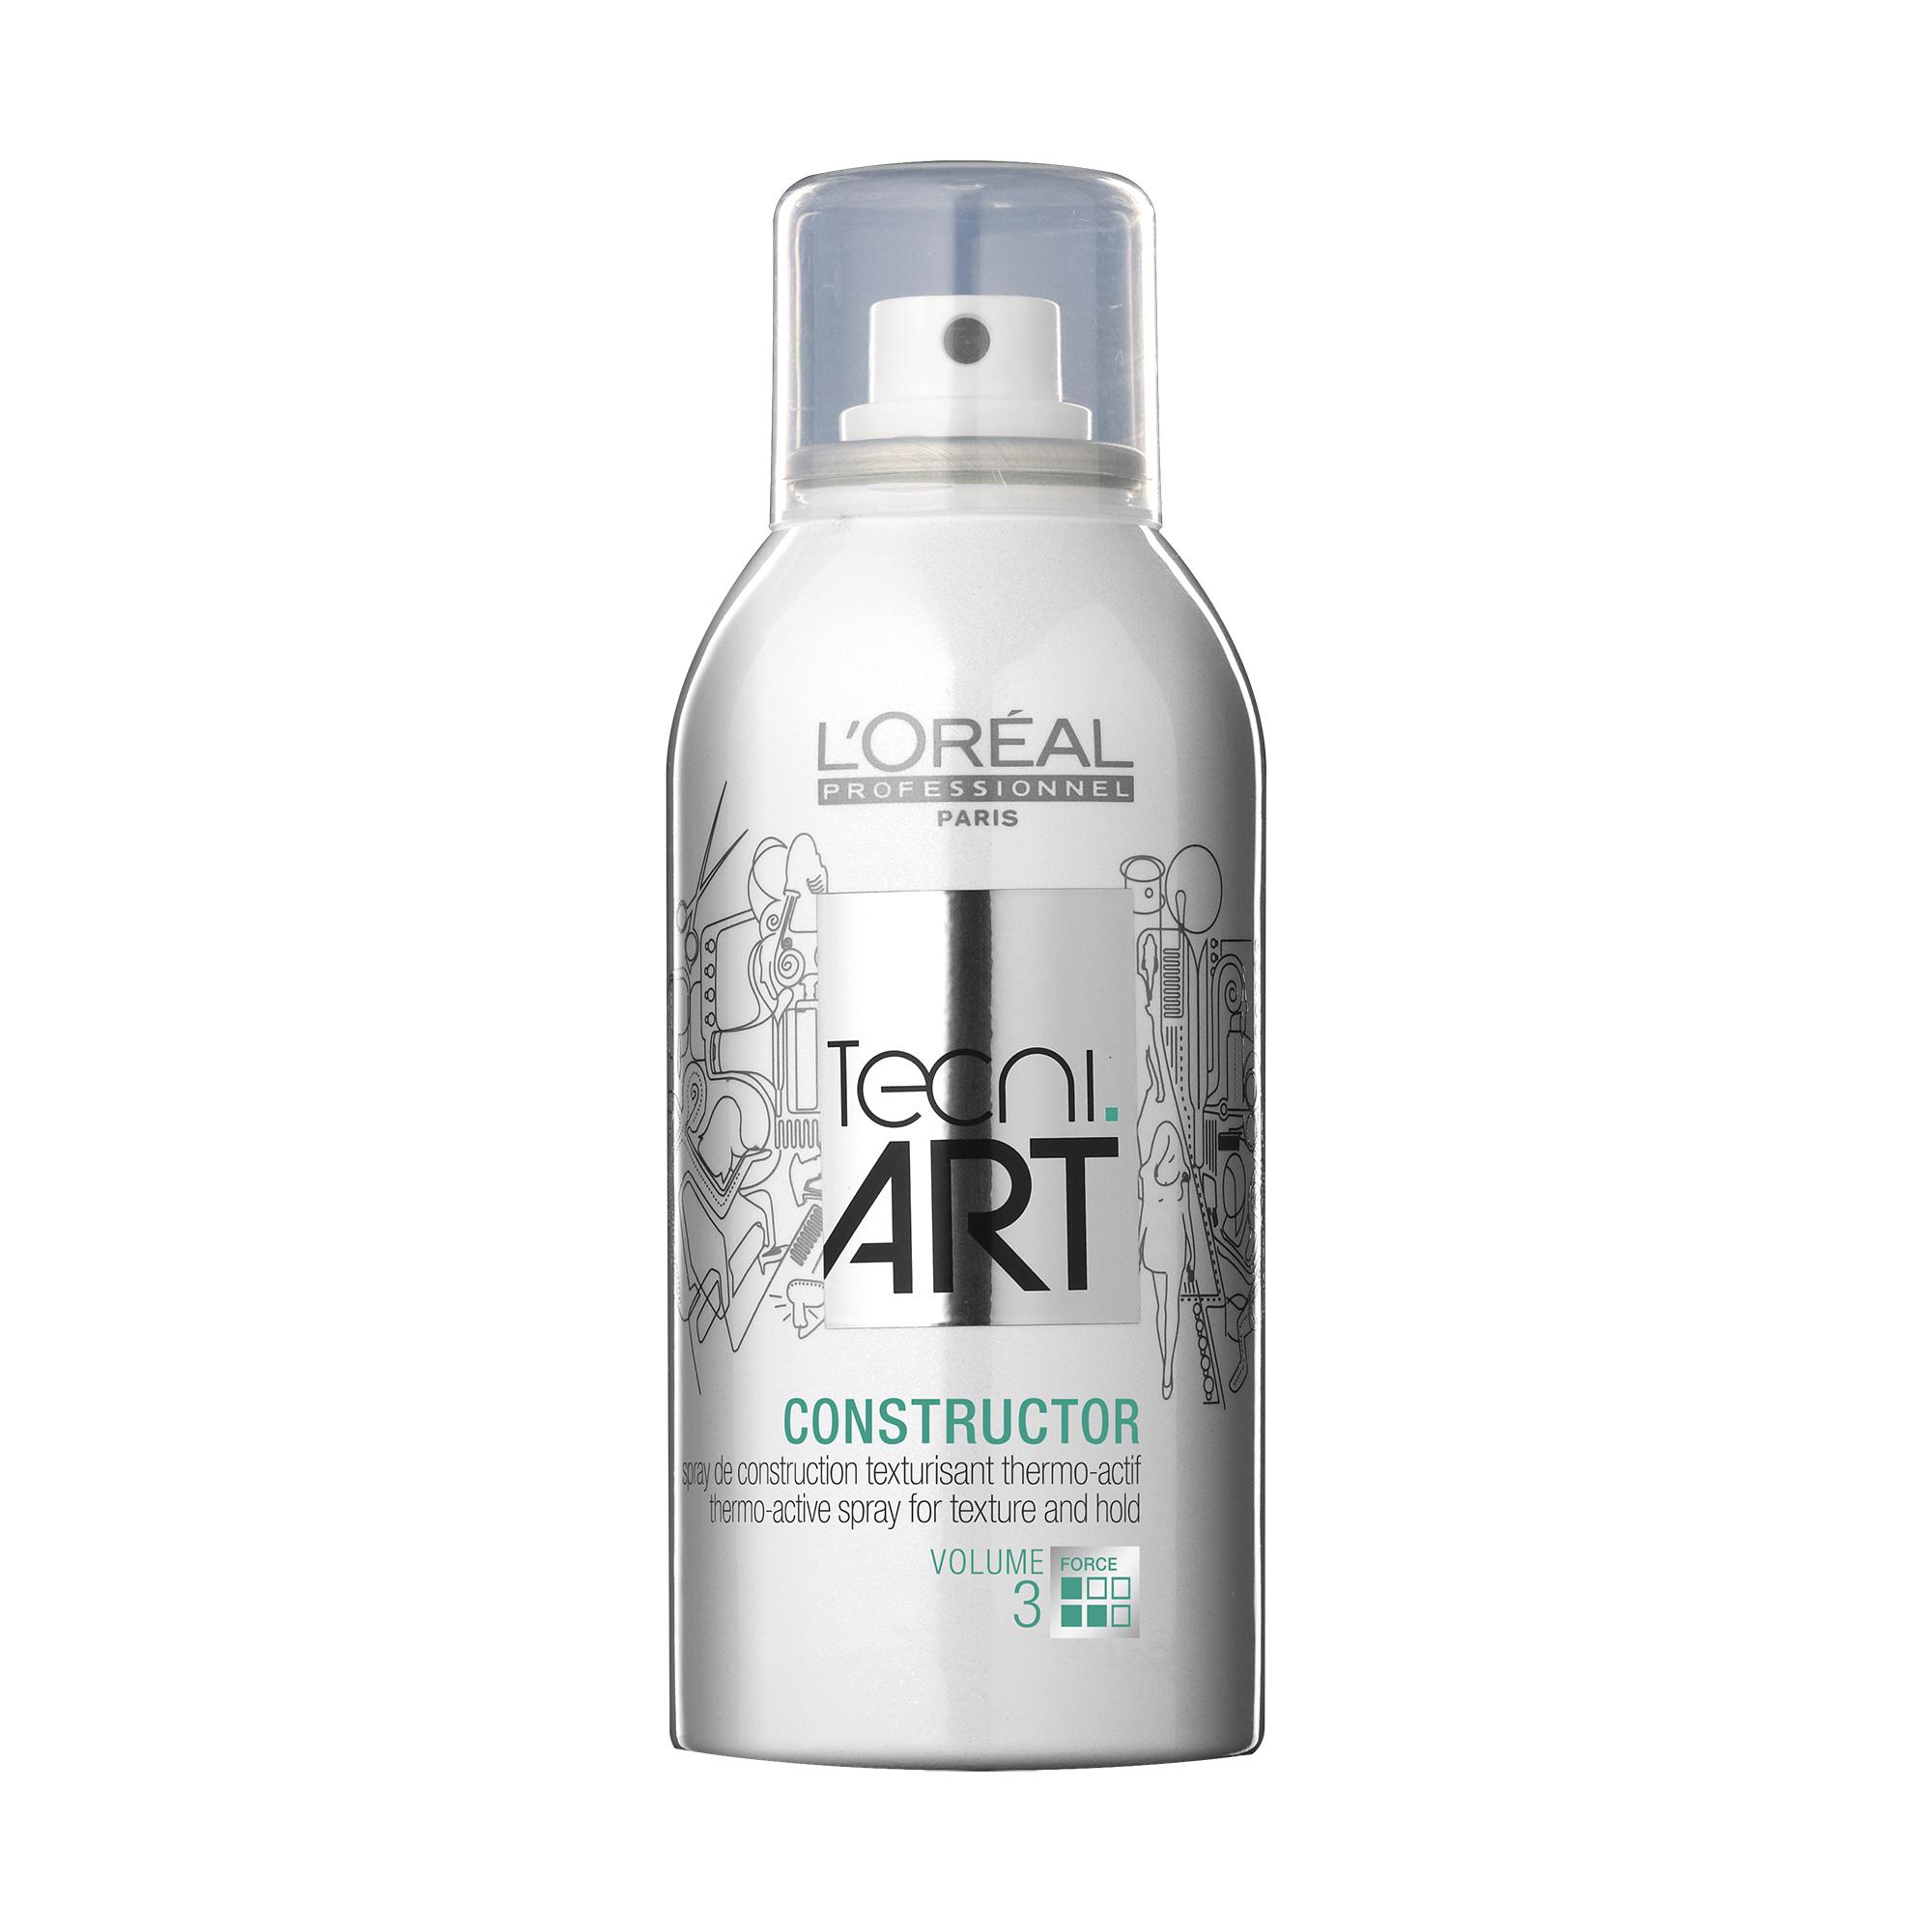 Tecni.Art Volume Constructor 150ml